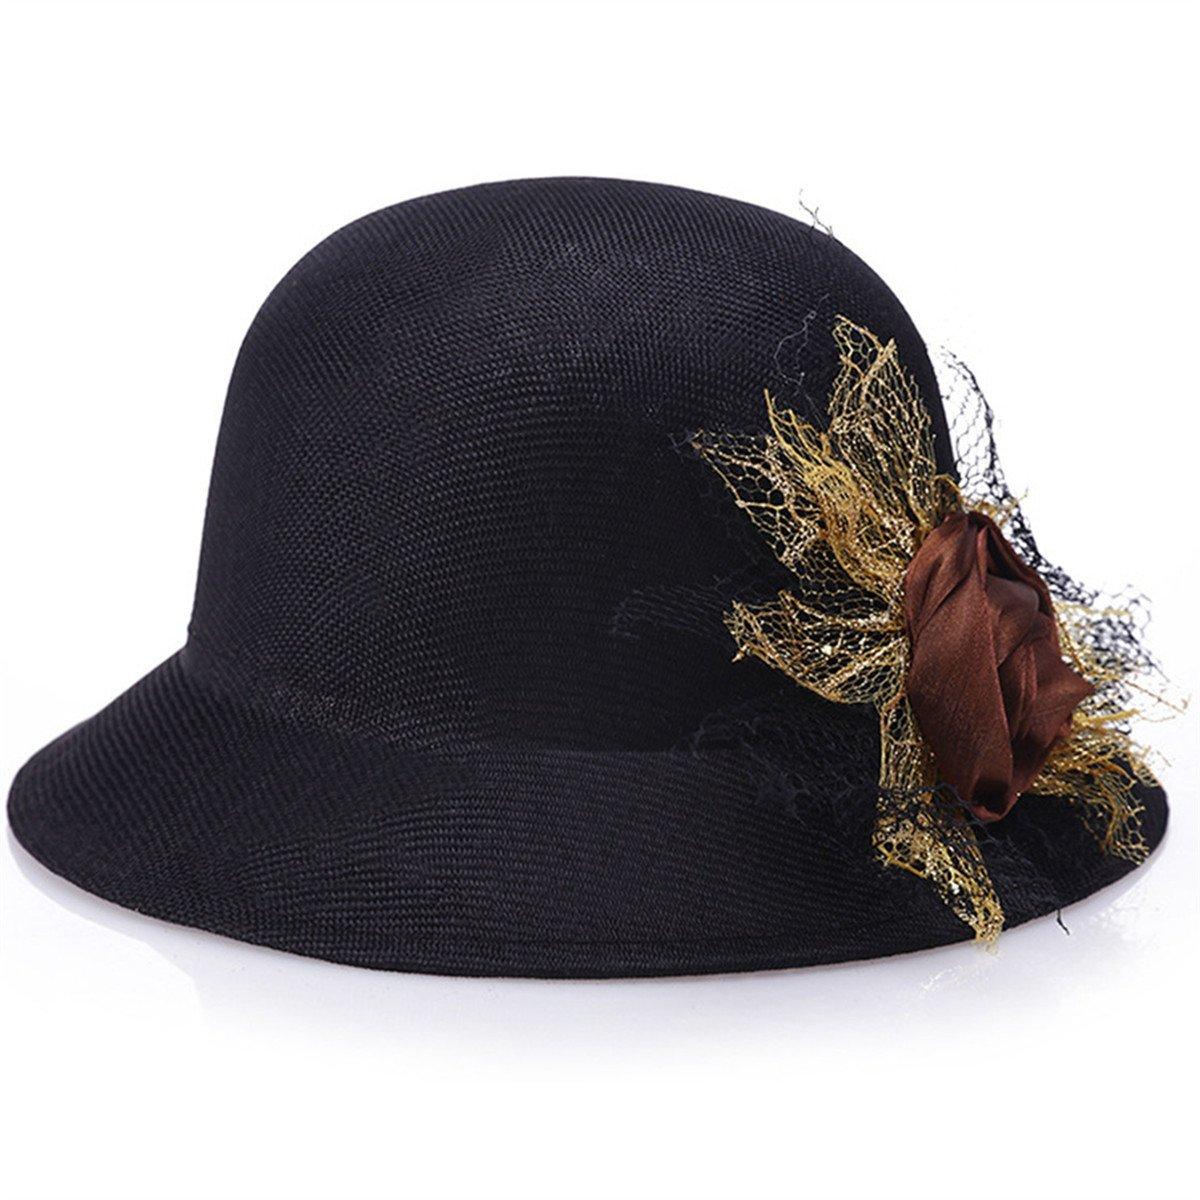 Qhome Womens Fedoras Hat For Female Bowler Hat Ladies Brand Beach Hat Summer Casual Vintage Cap Travel Flower Cap